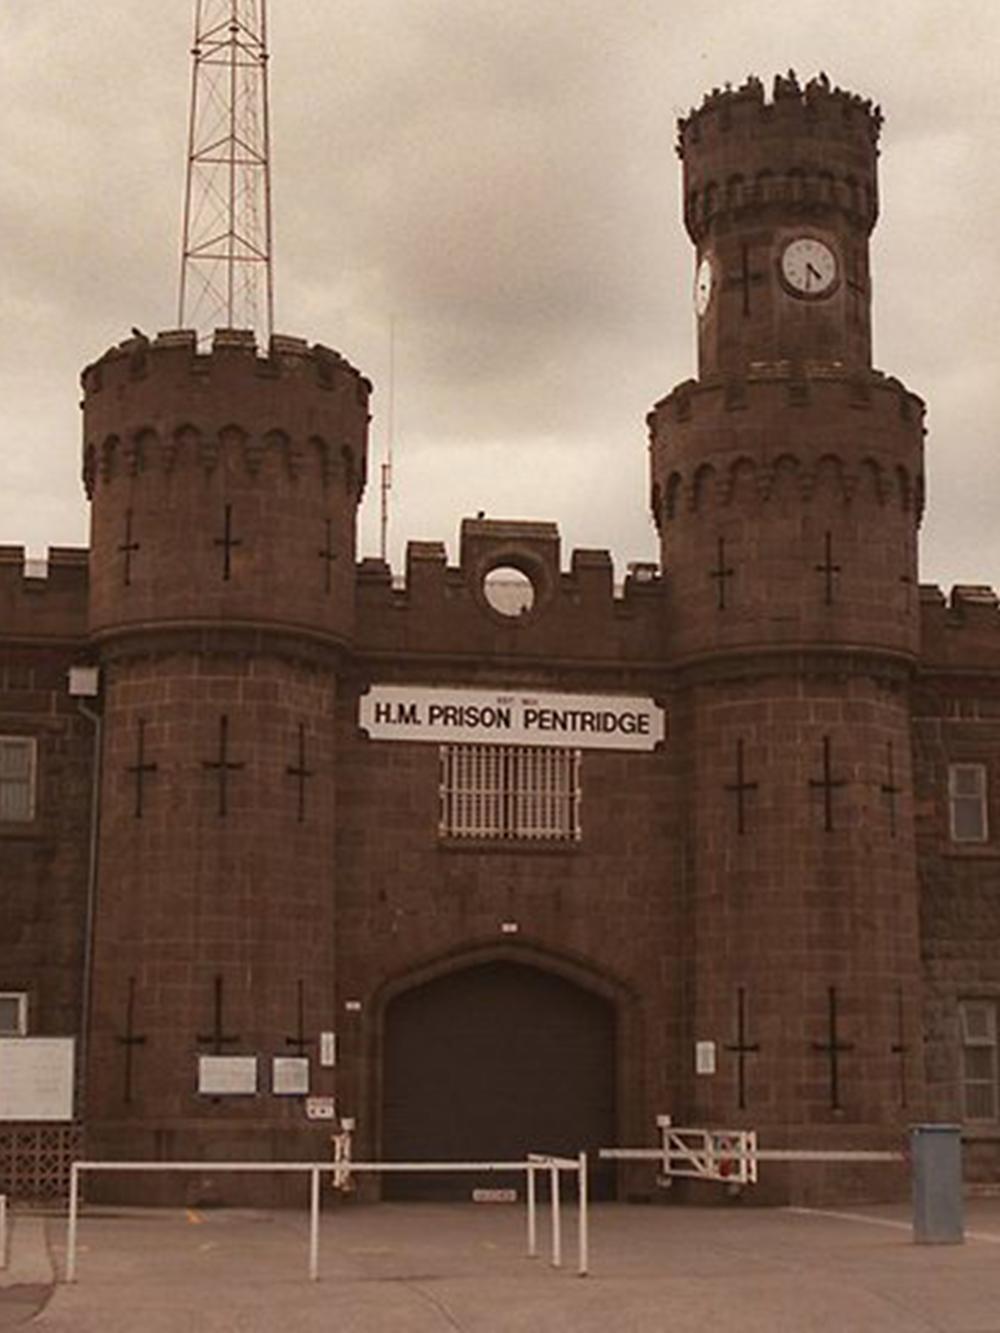 Pentridge Prison image from the Herald Sun